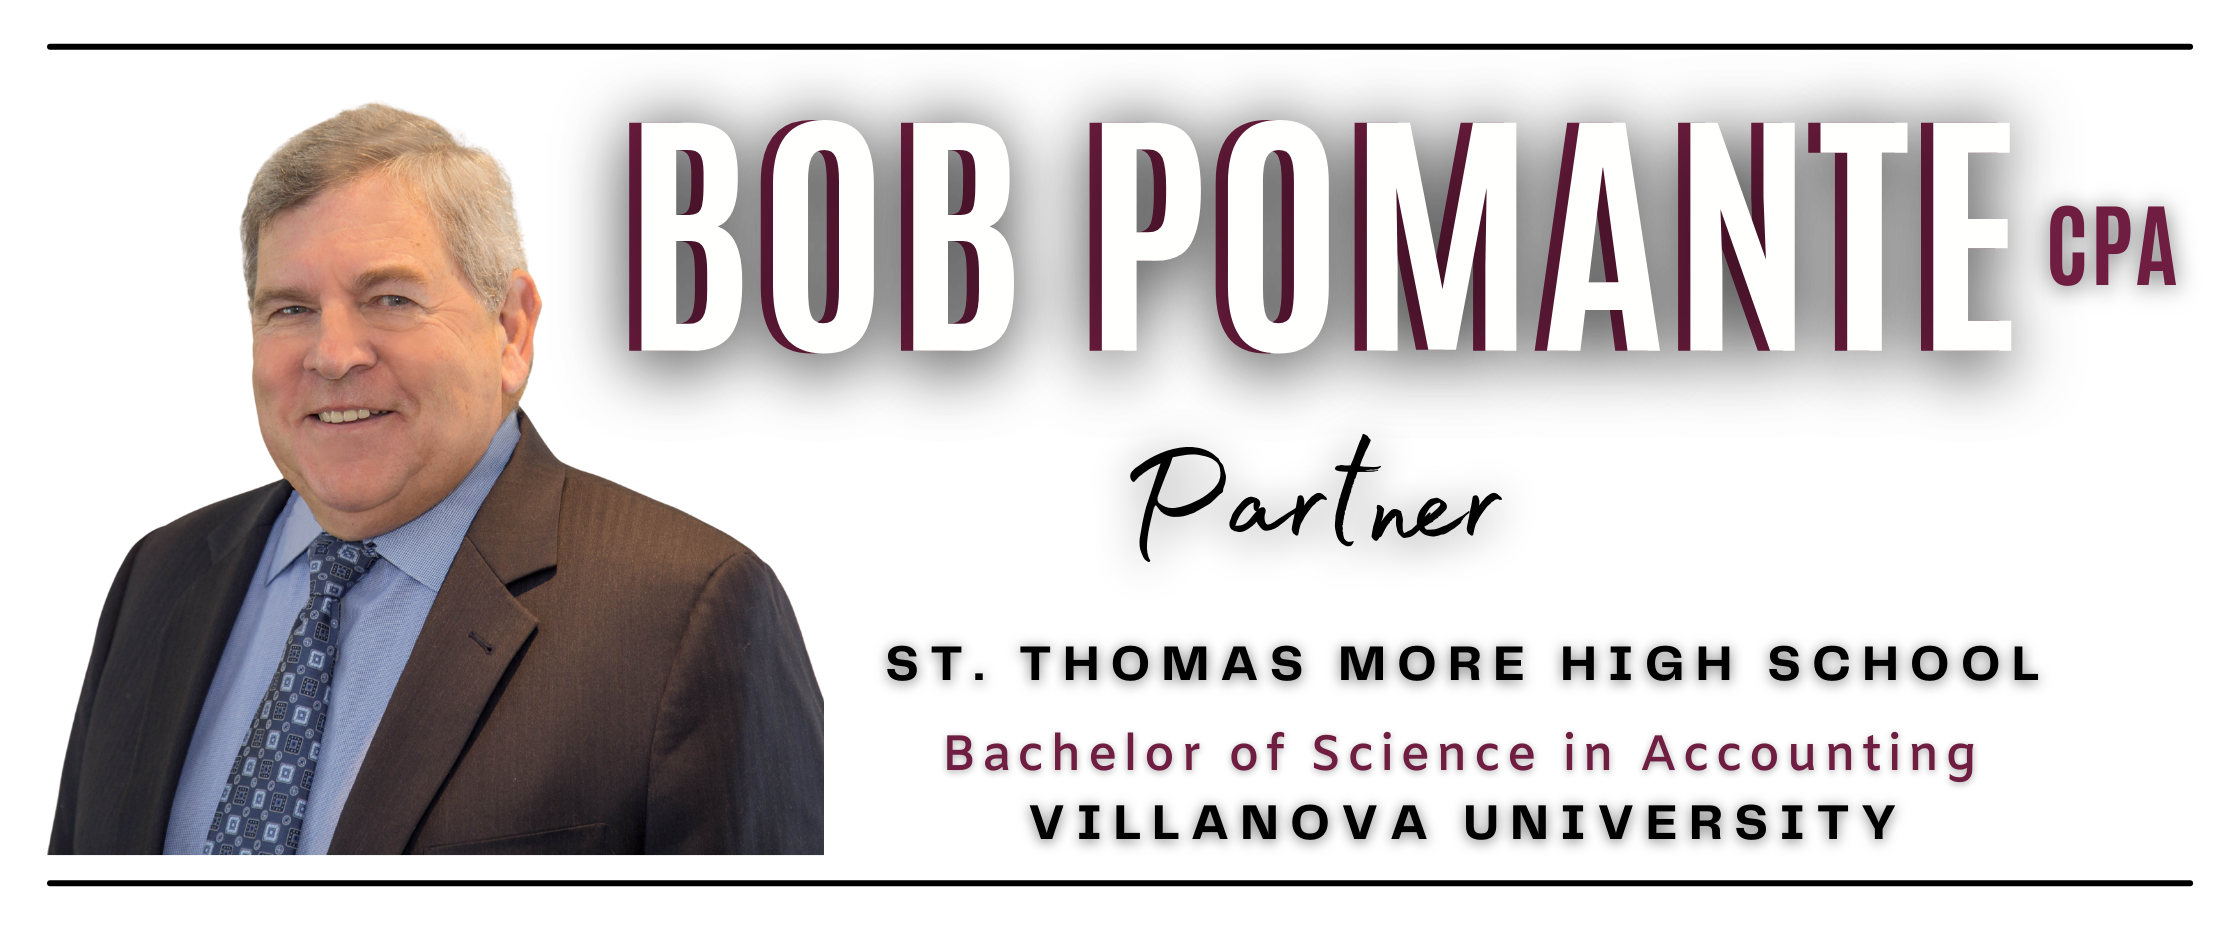 BobPomante-1